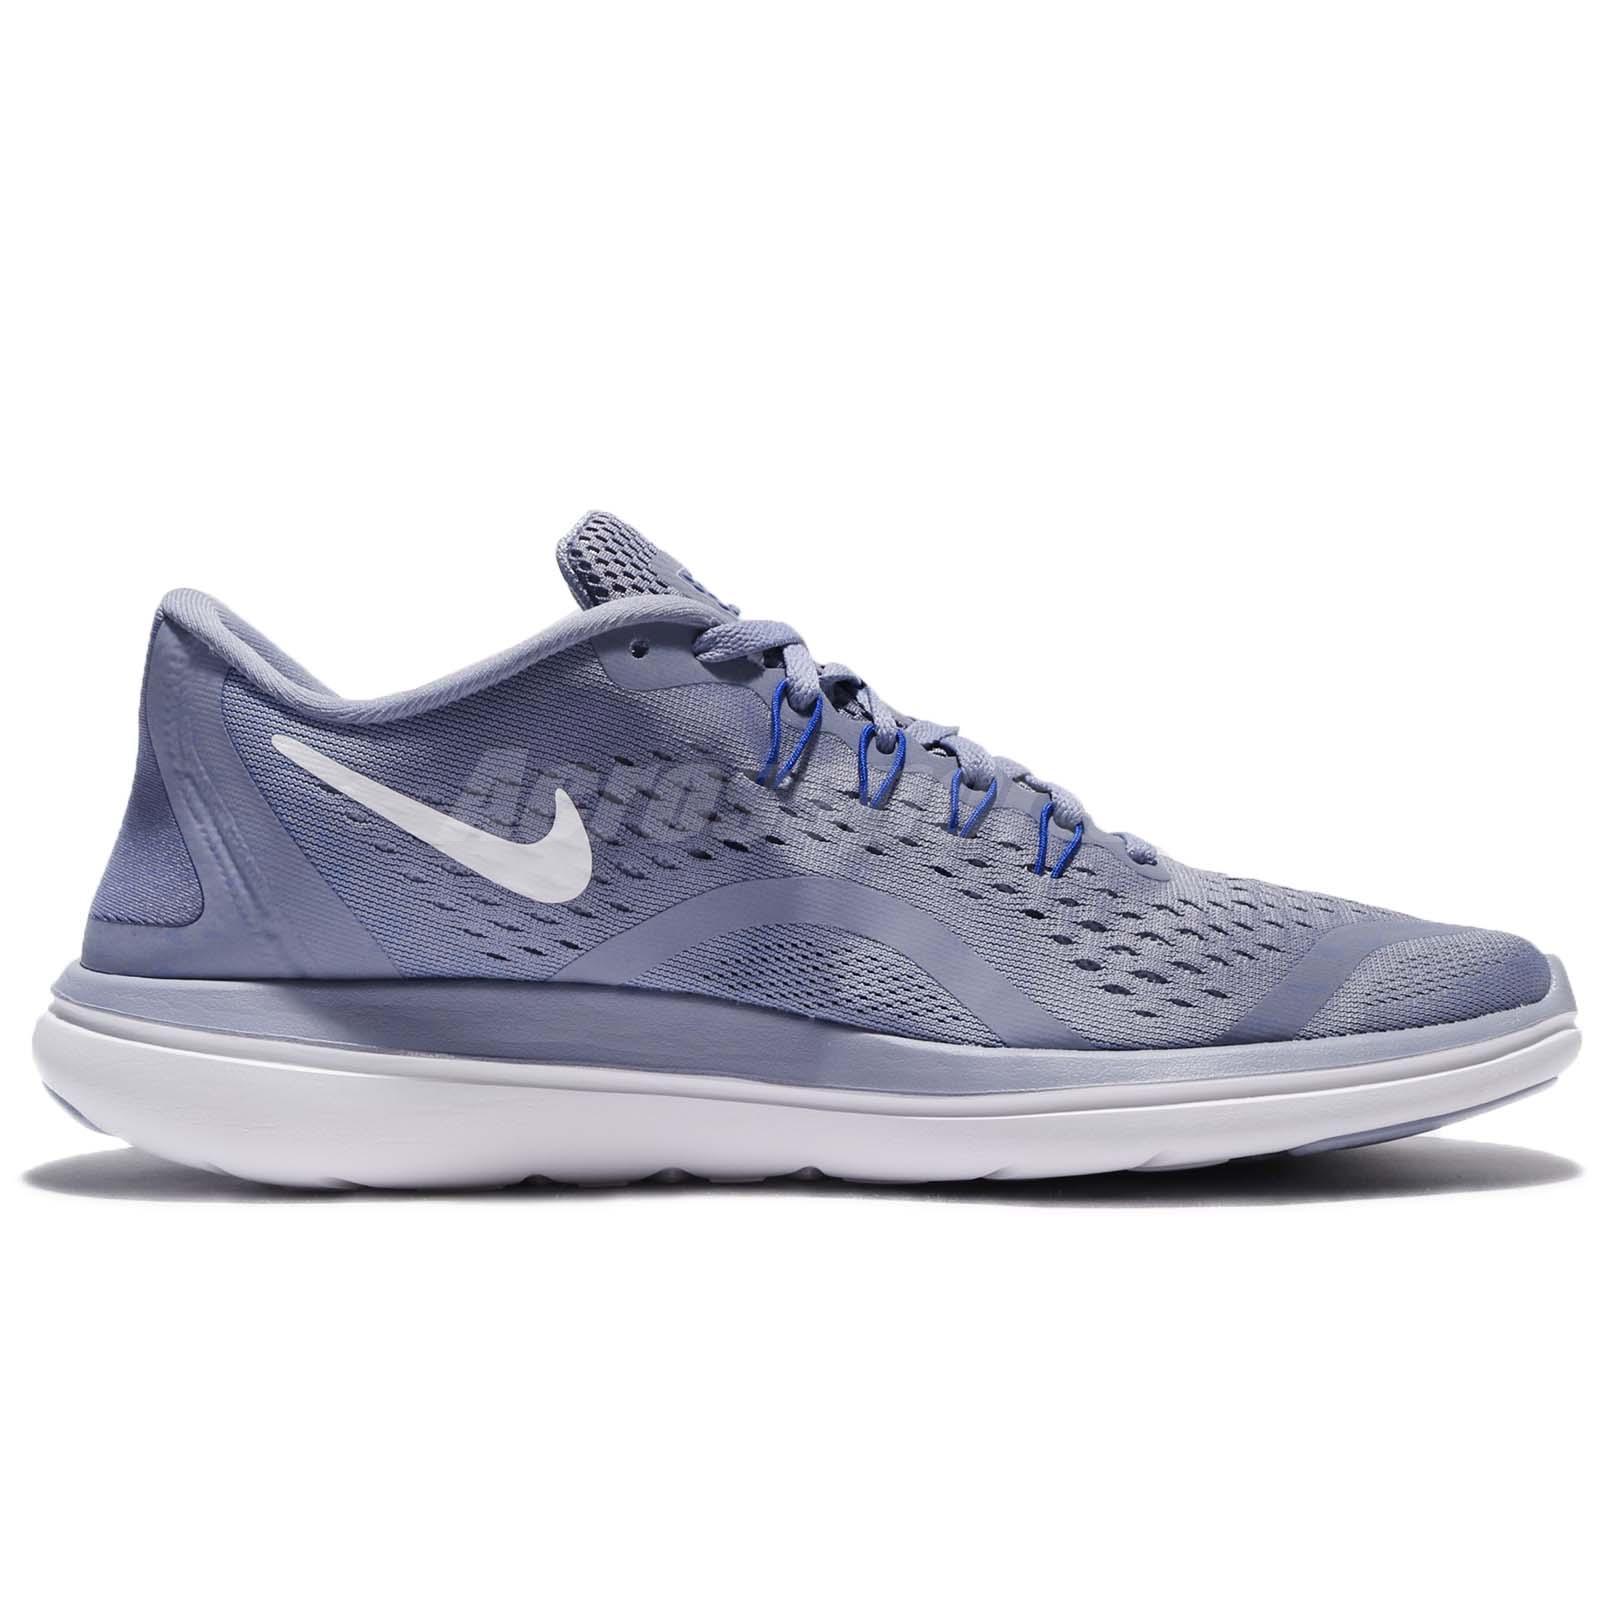 898457 RN Flex Nike 002 2017 UK9 hombre para Zapatillas